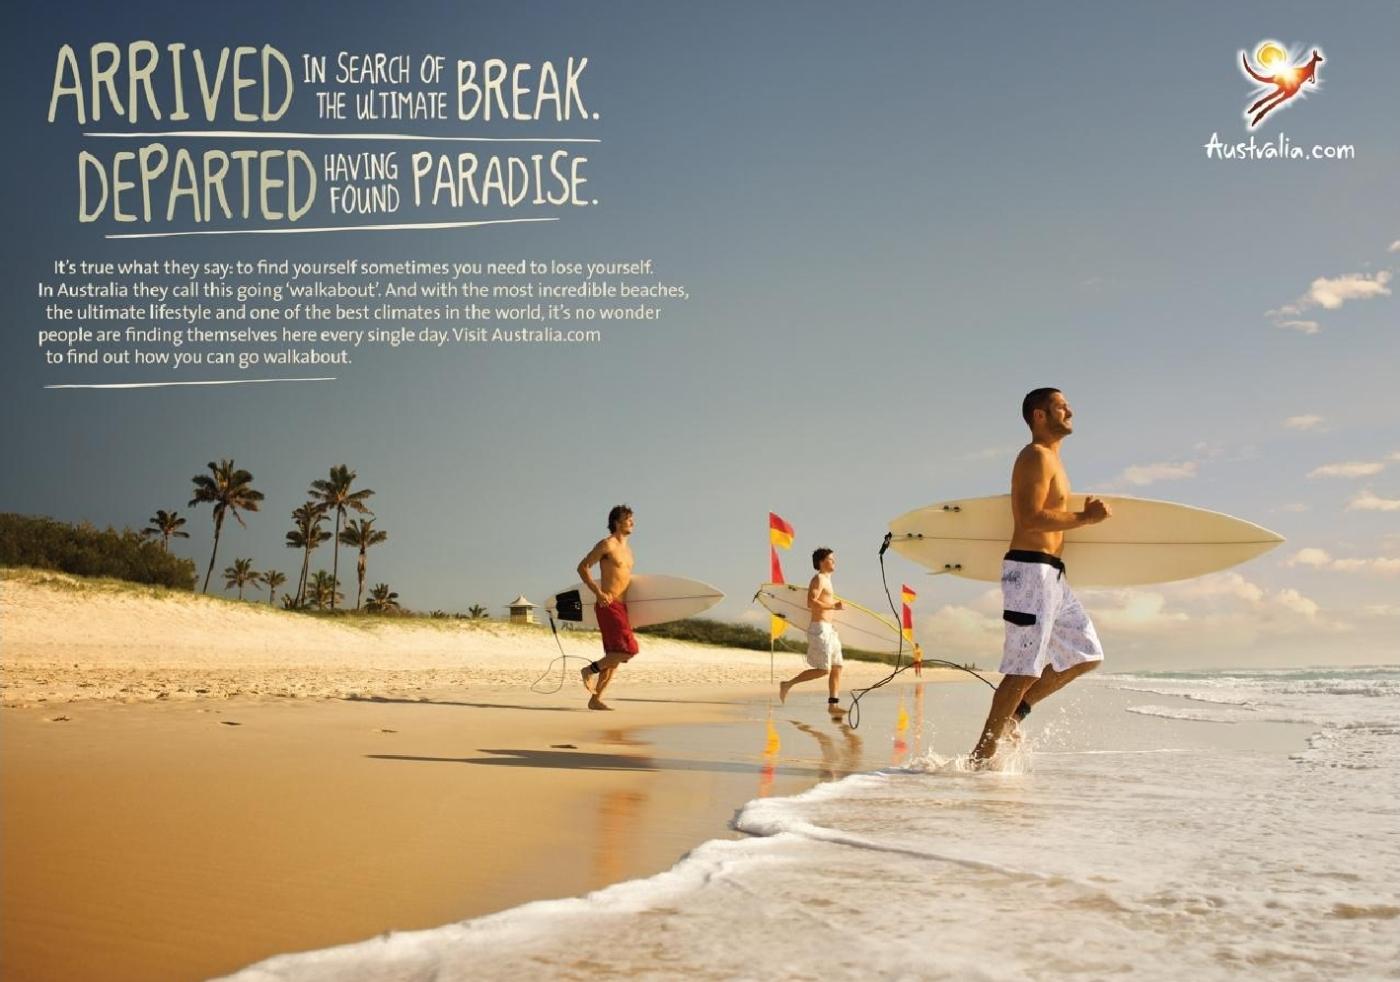 tourism_australia_beach.jpg